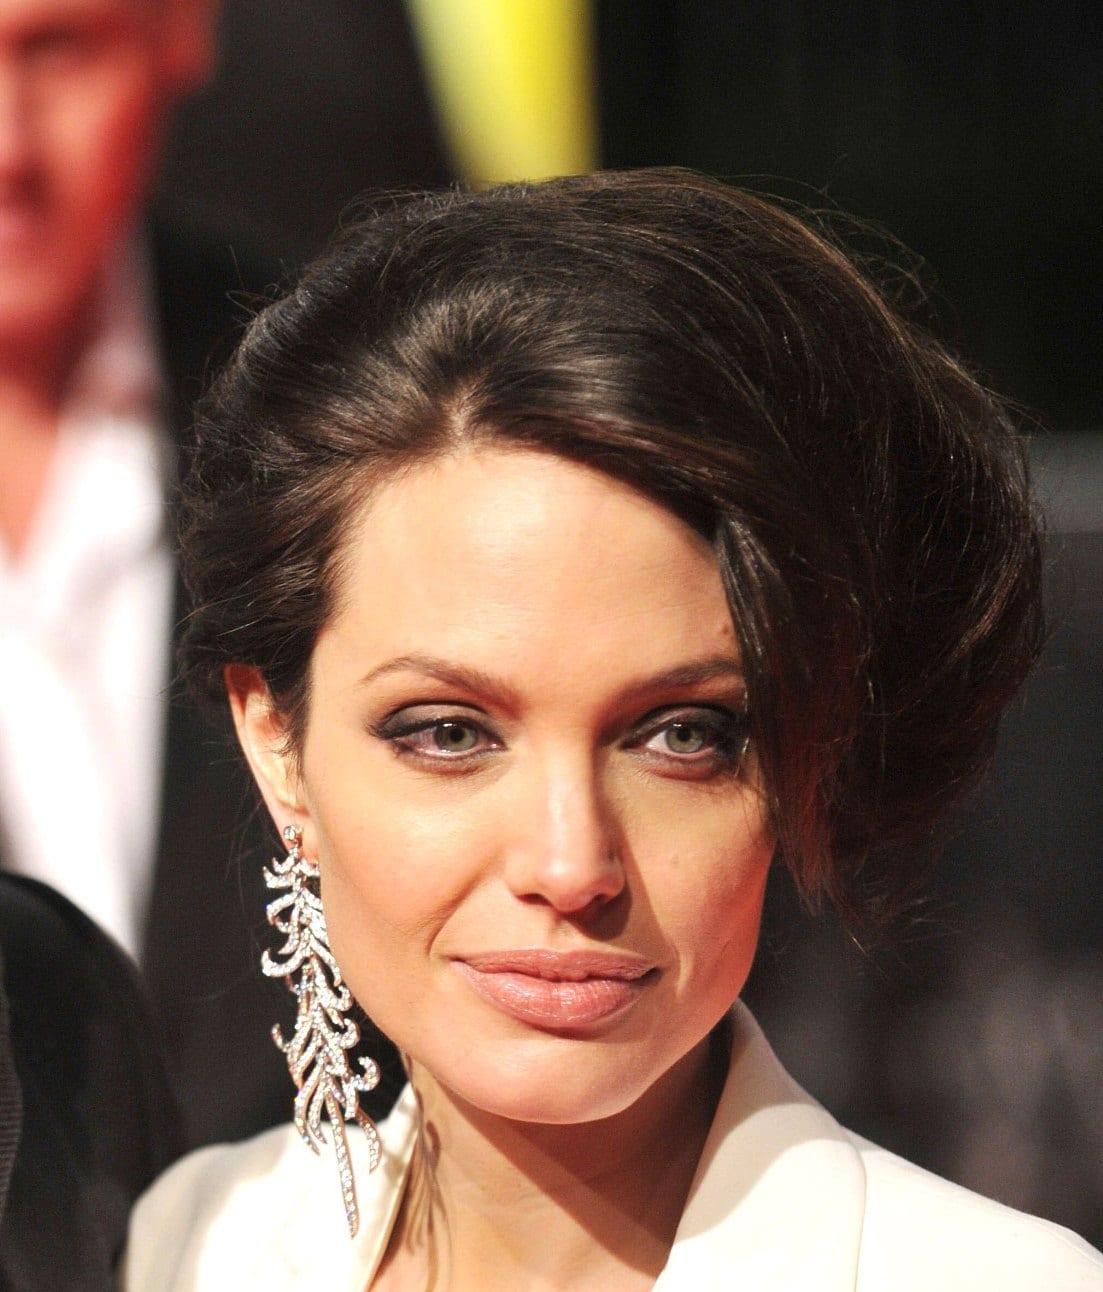 От бунтарки до женщины мечты: бьюти-эволюция Анджелины Джоли